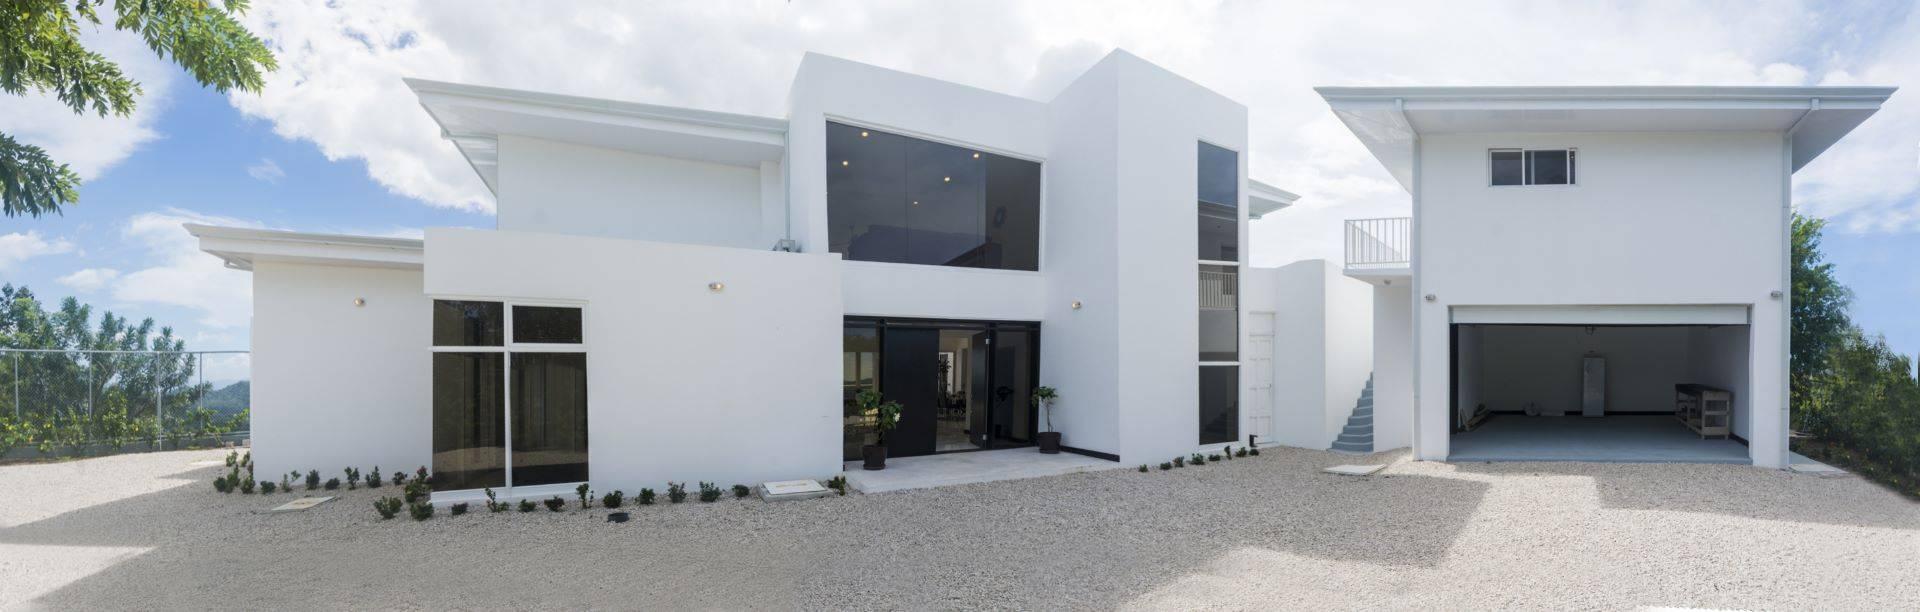 Casa Blanca | Costa Rica Real Estate and Rentals